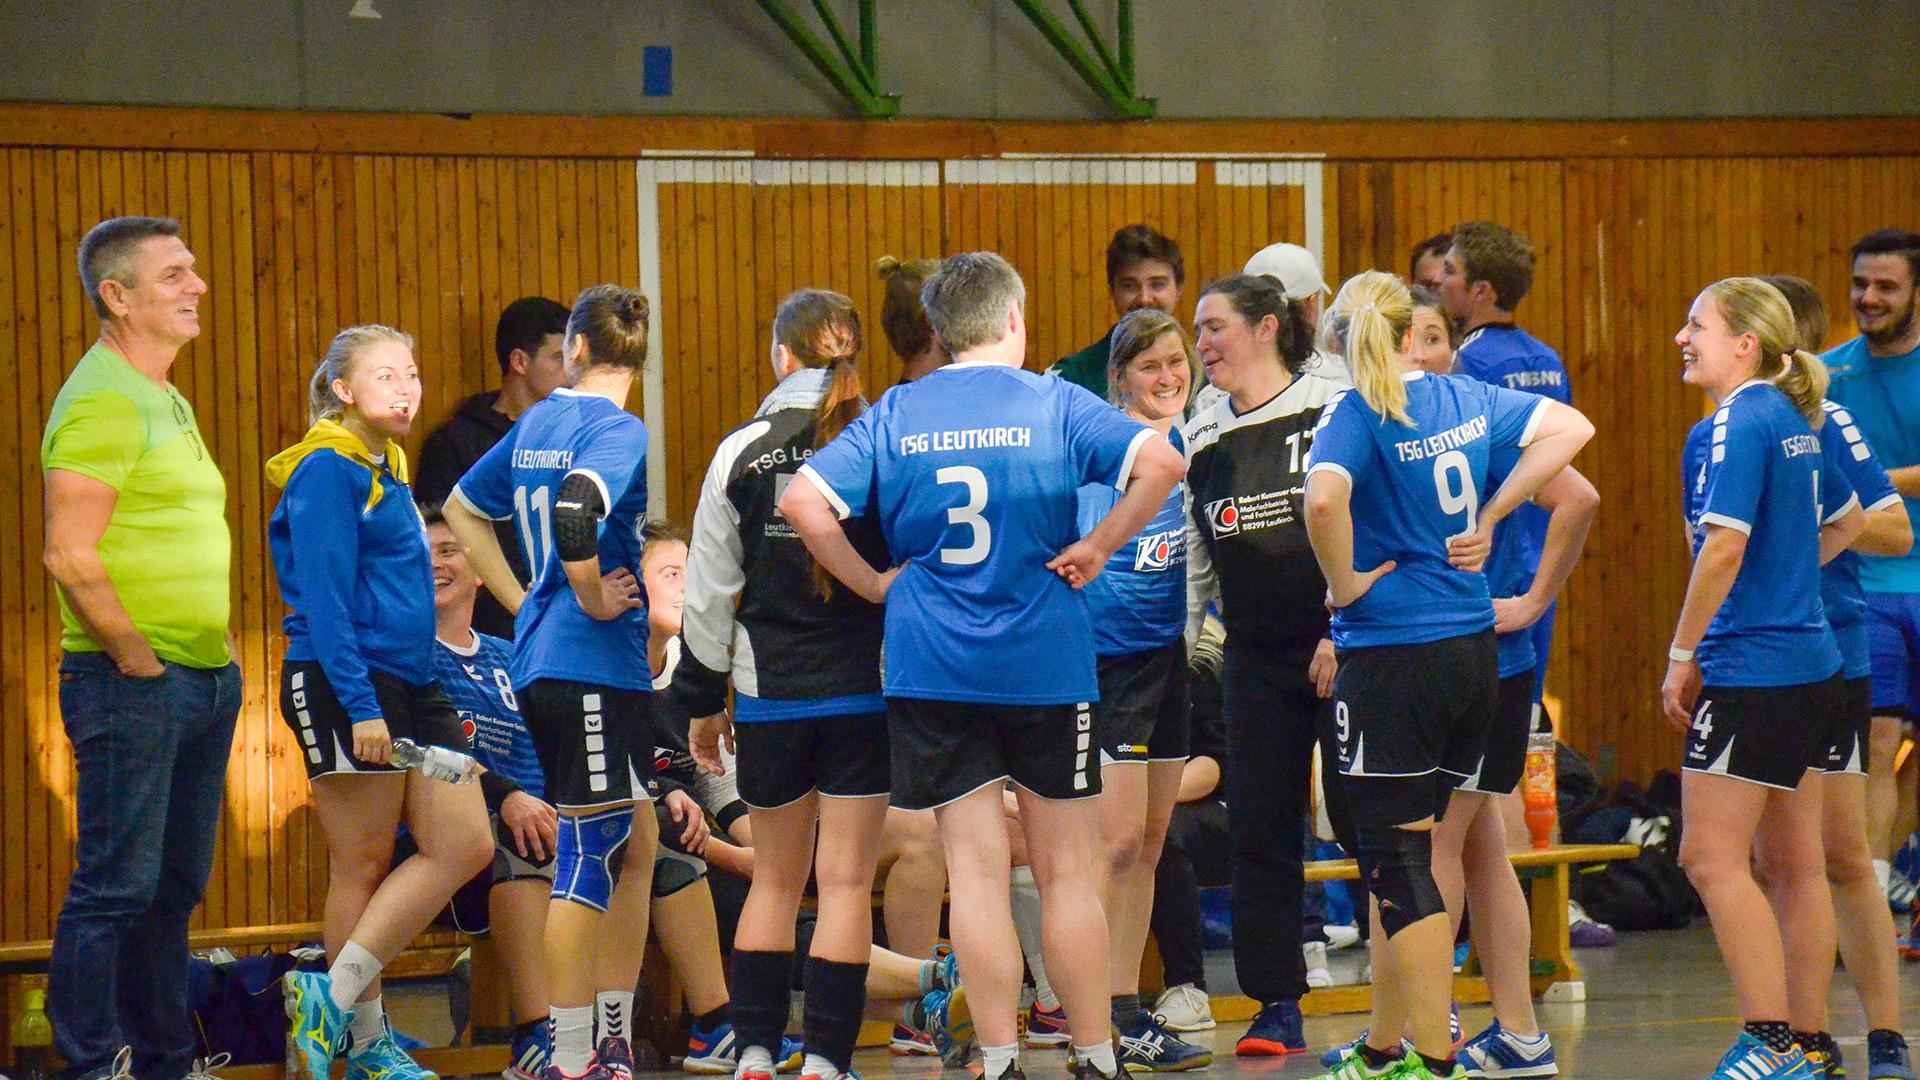 048Slider_F30_tsg_leutkirch_handball